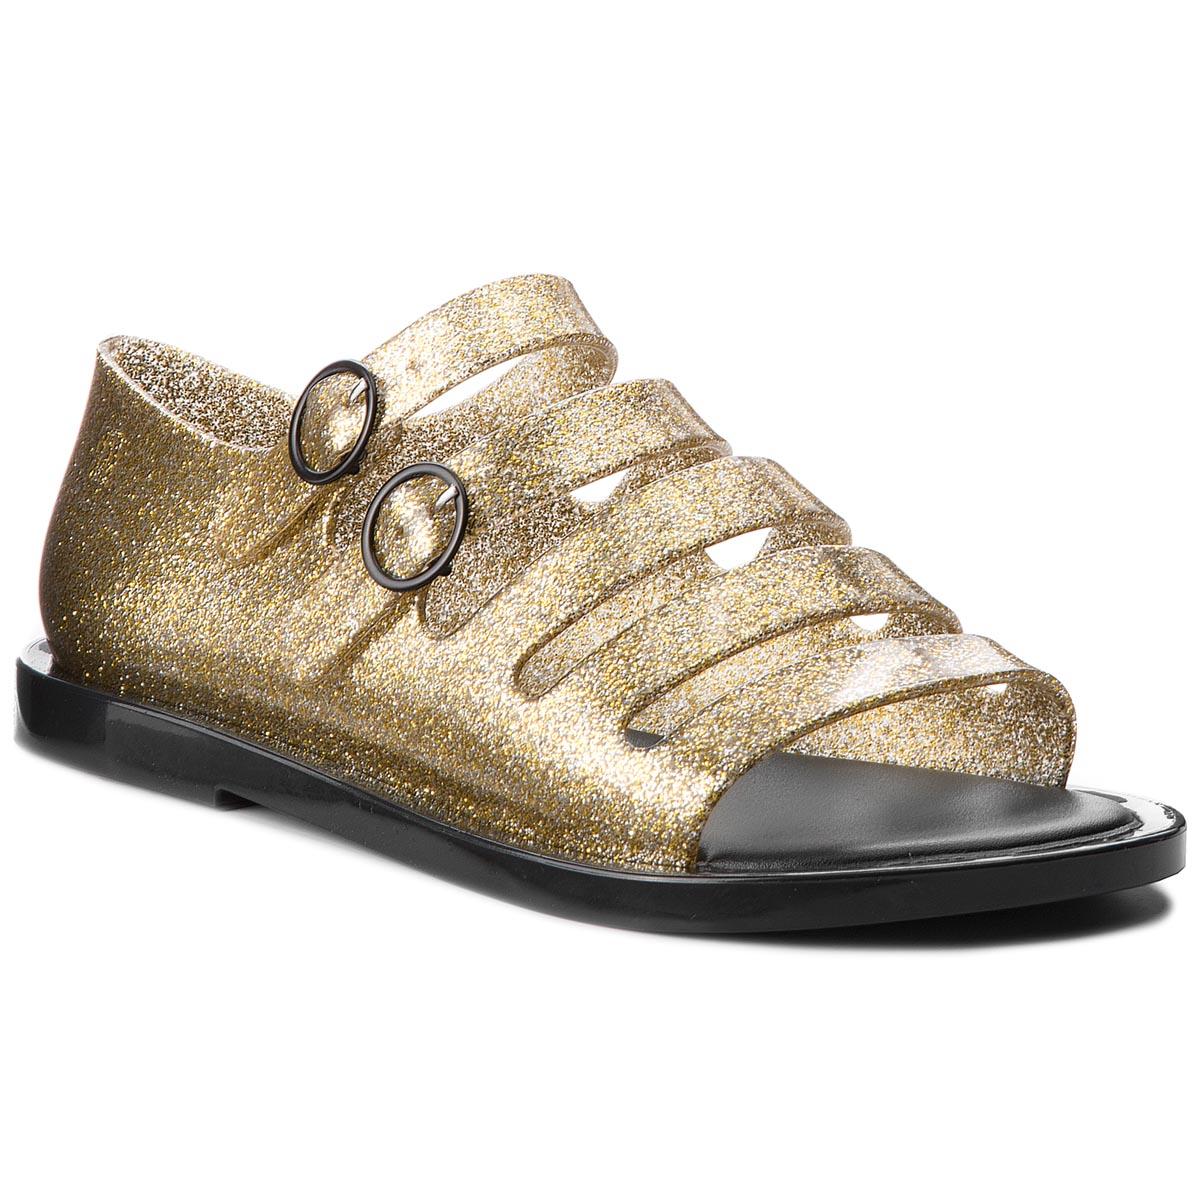 MELISSA 32322 51485 Ad Broadway BeigeBlack Sandals Casual gZq0BAwqR